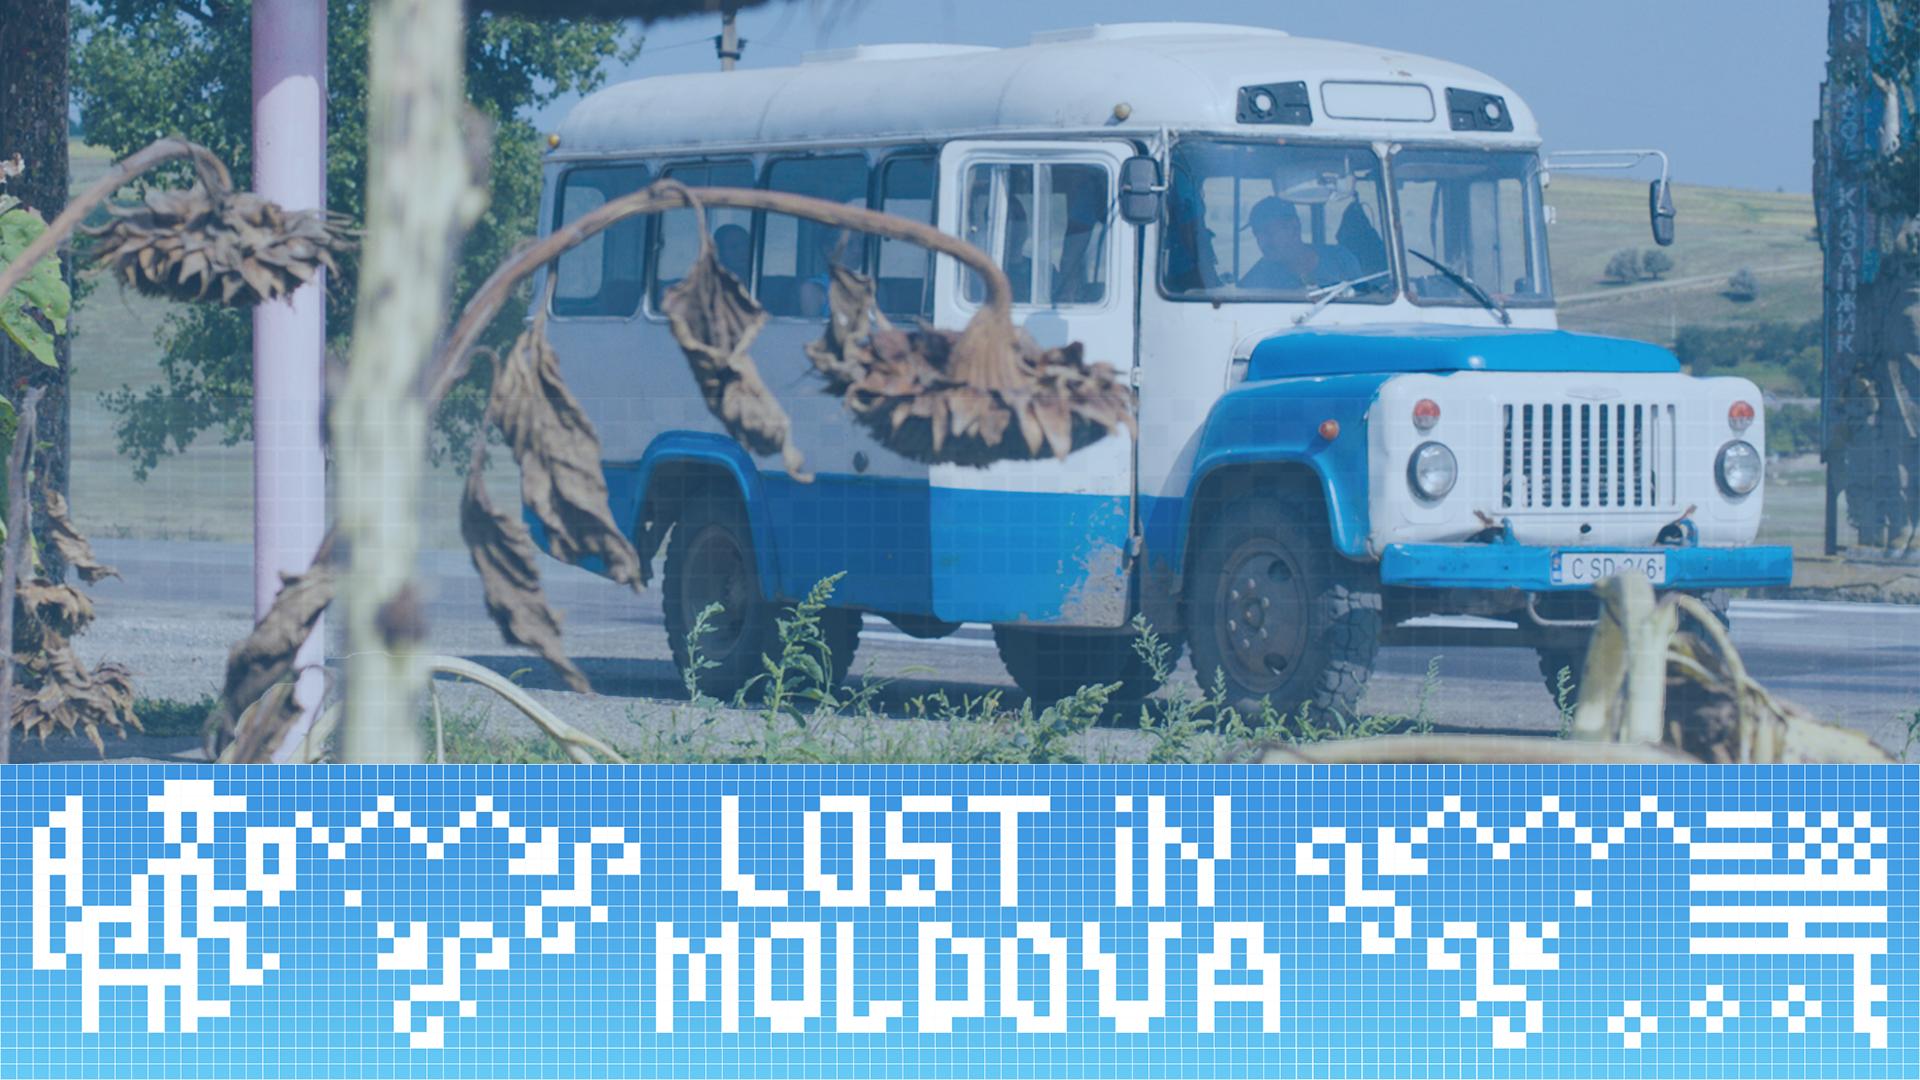 Lost in Moldova - web seriesassociate producerwww.lostinmoldova.com